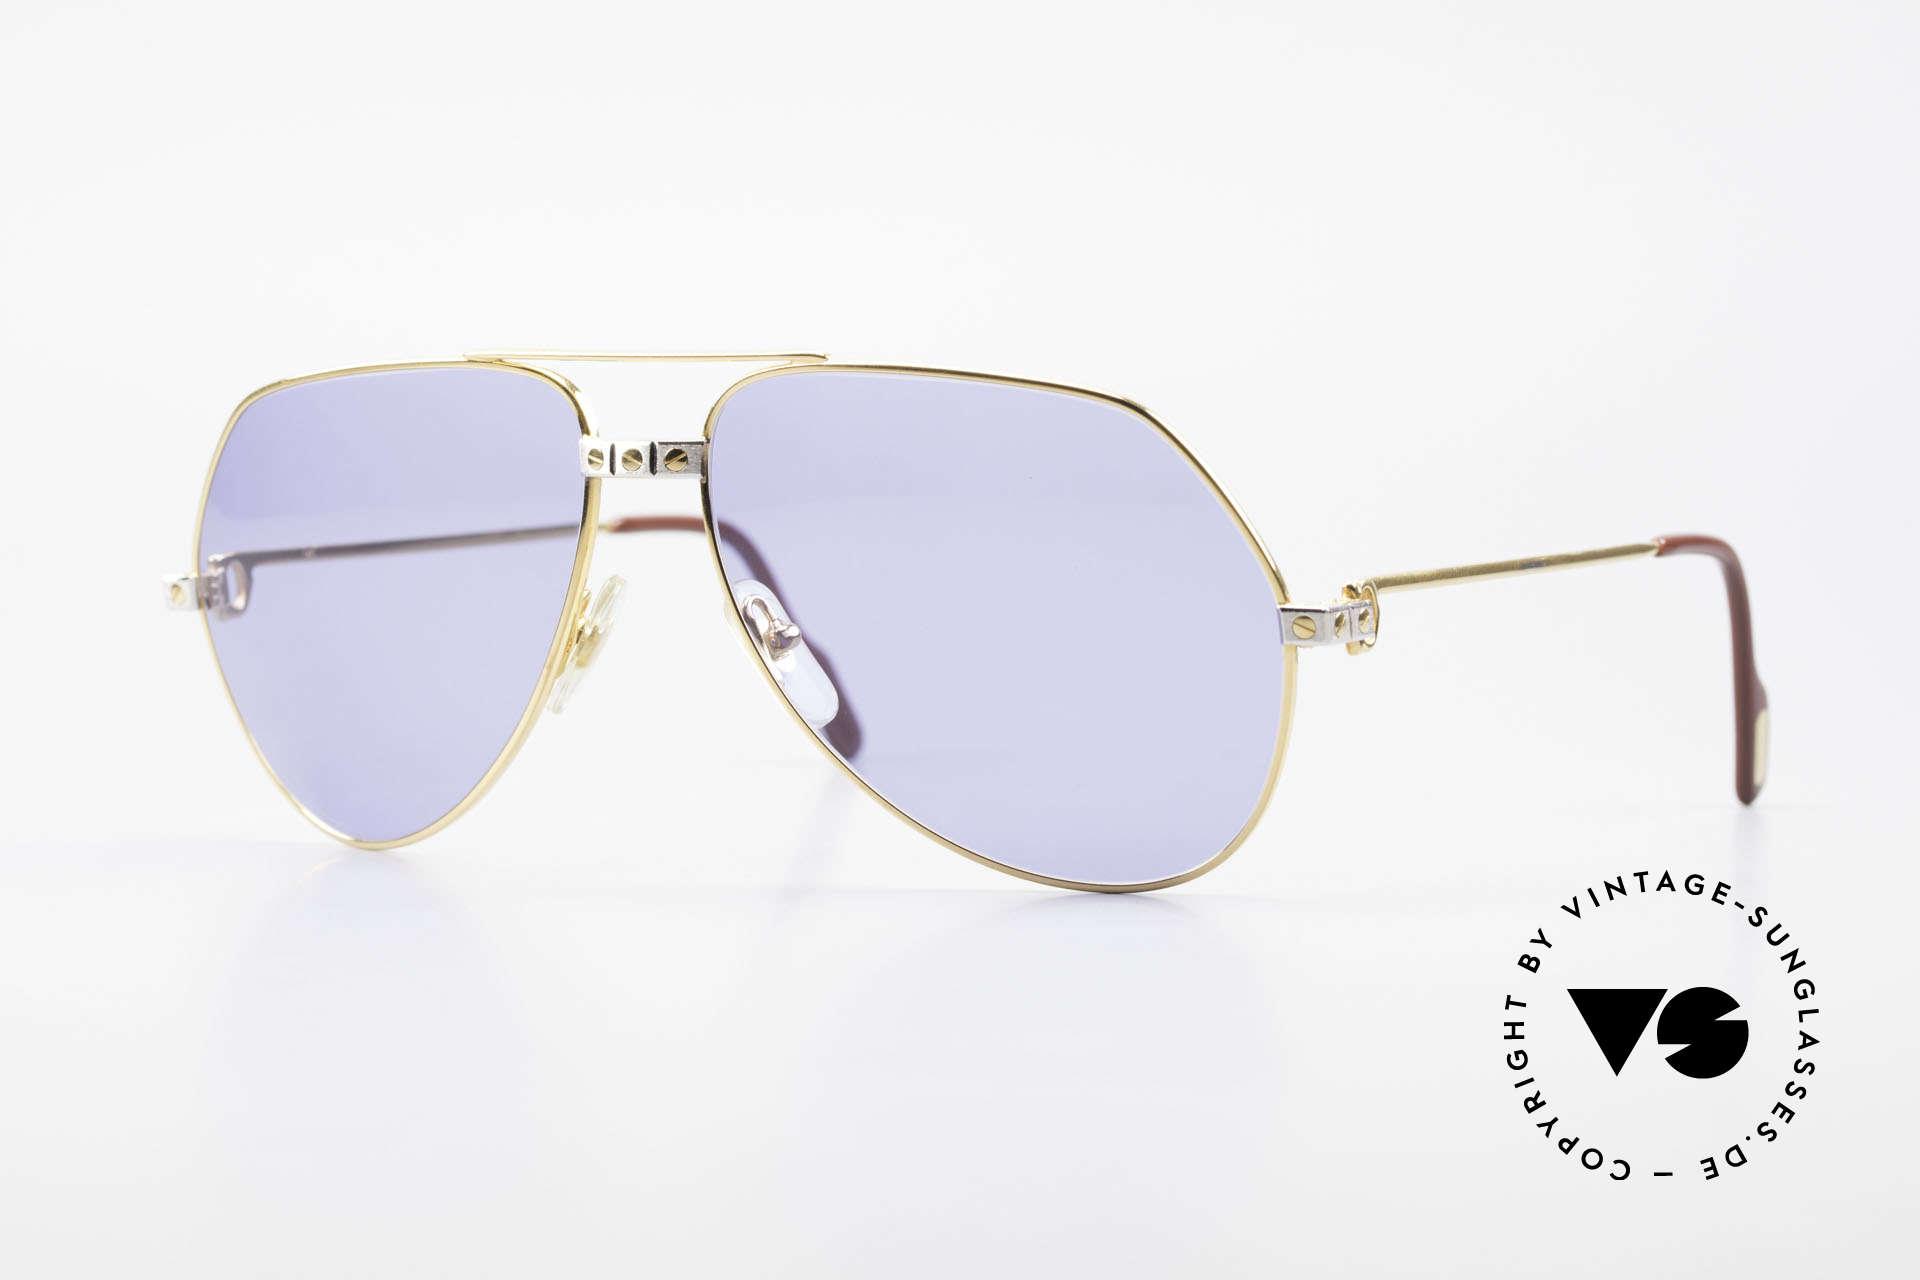 Cartier Vendome Santos - L 80's Luxury Aviator Sunglasses, Vendome = the most famous eyewear design by CARTIER, Made for Men